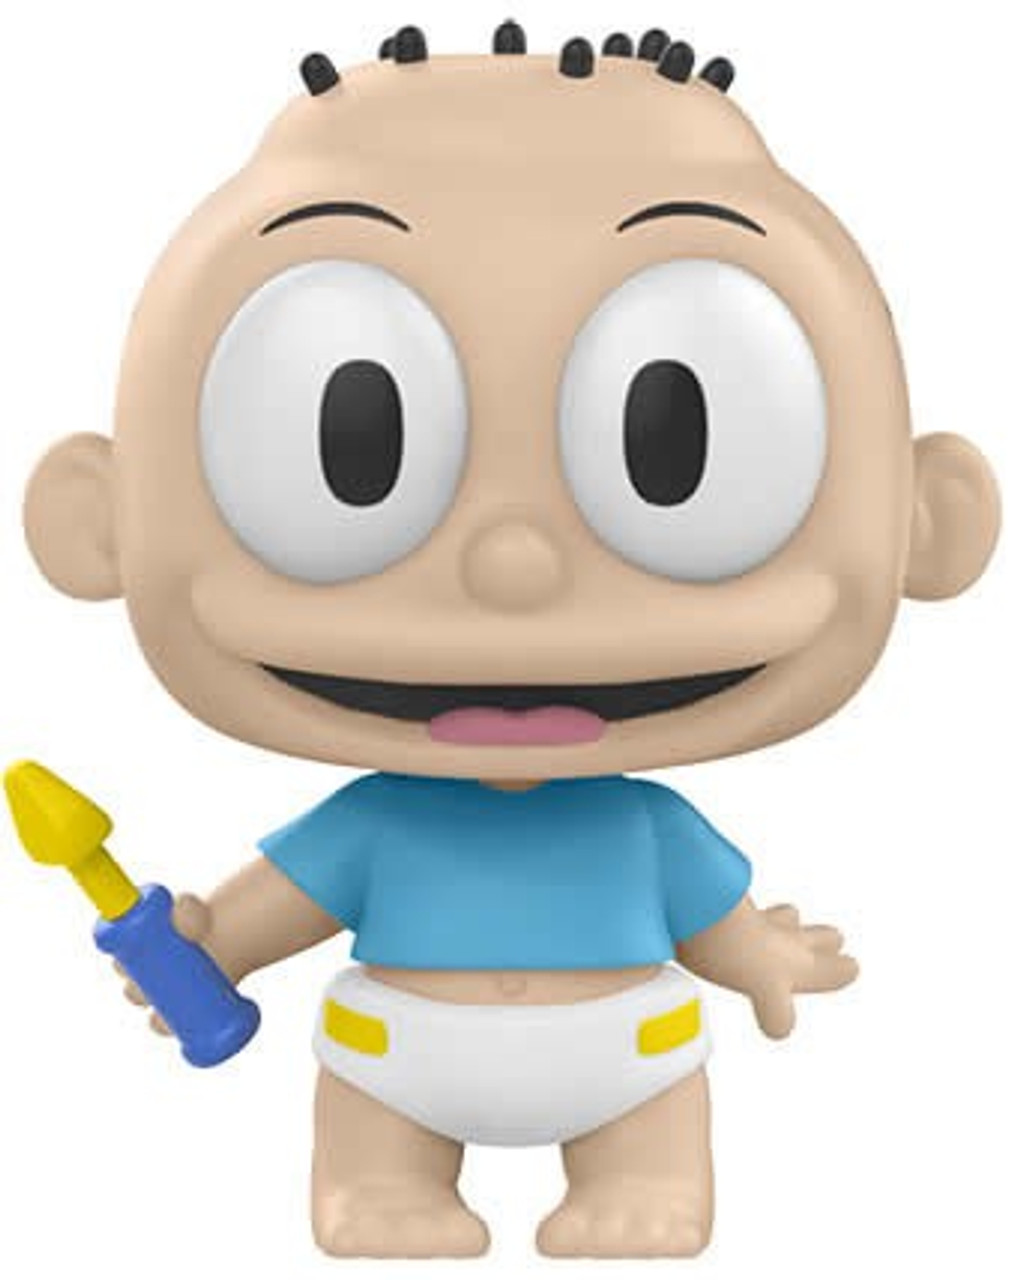 nickelodeon funko mystery mini Rugrats Chucky